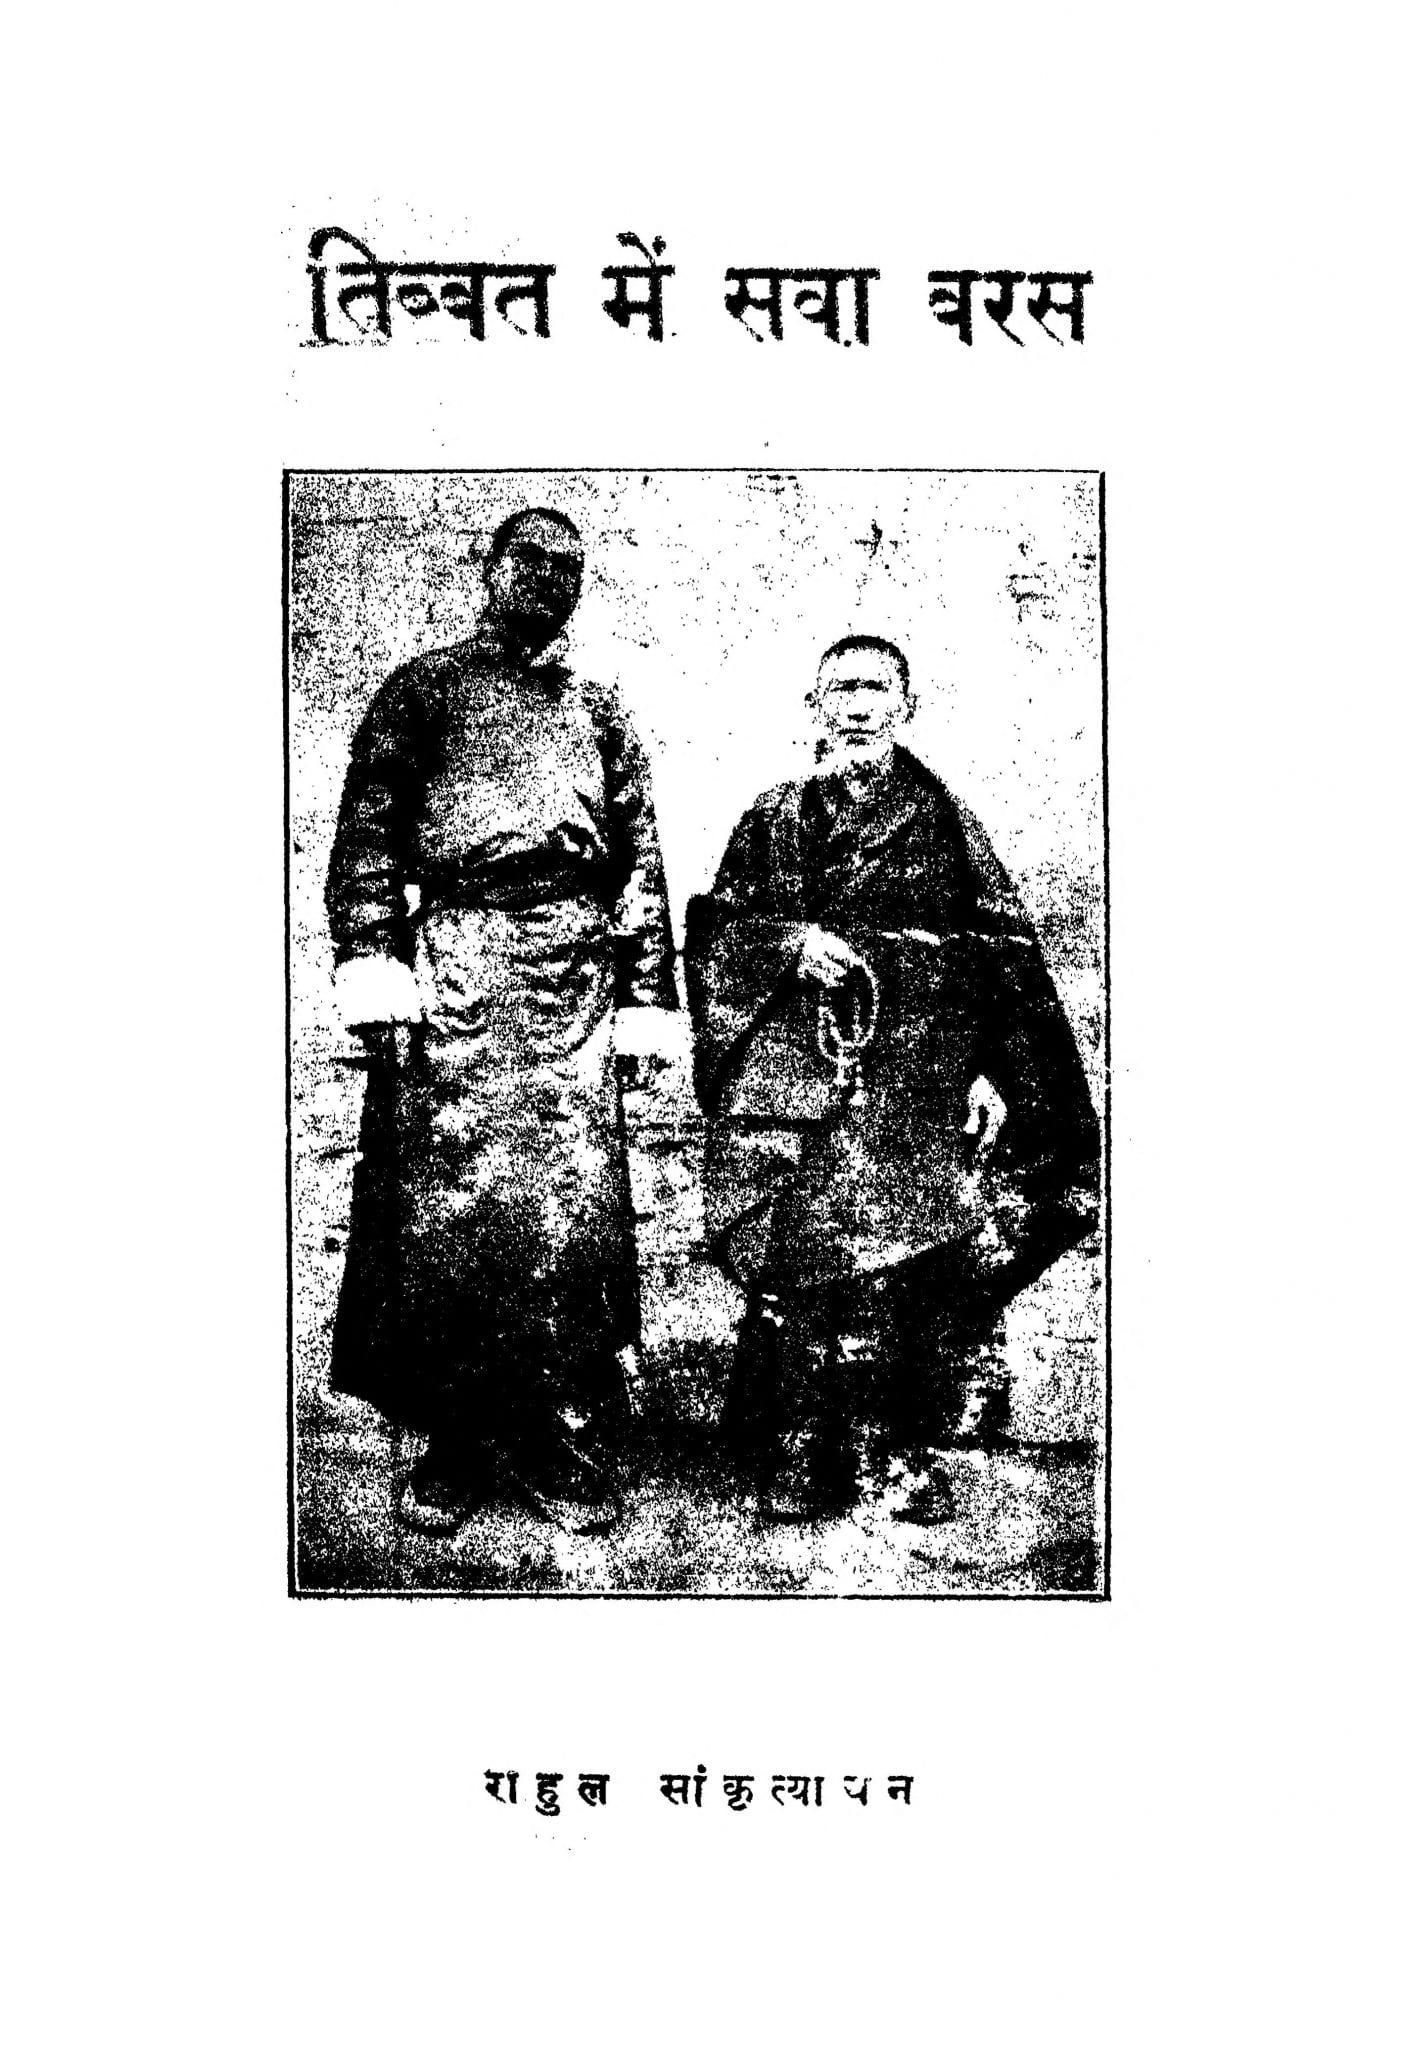 Book Image : तिब्बत में सवा बरस - Tibbat Men Sava Baras